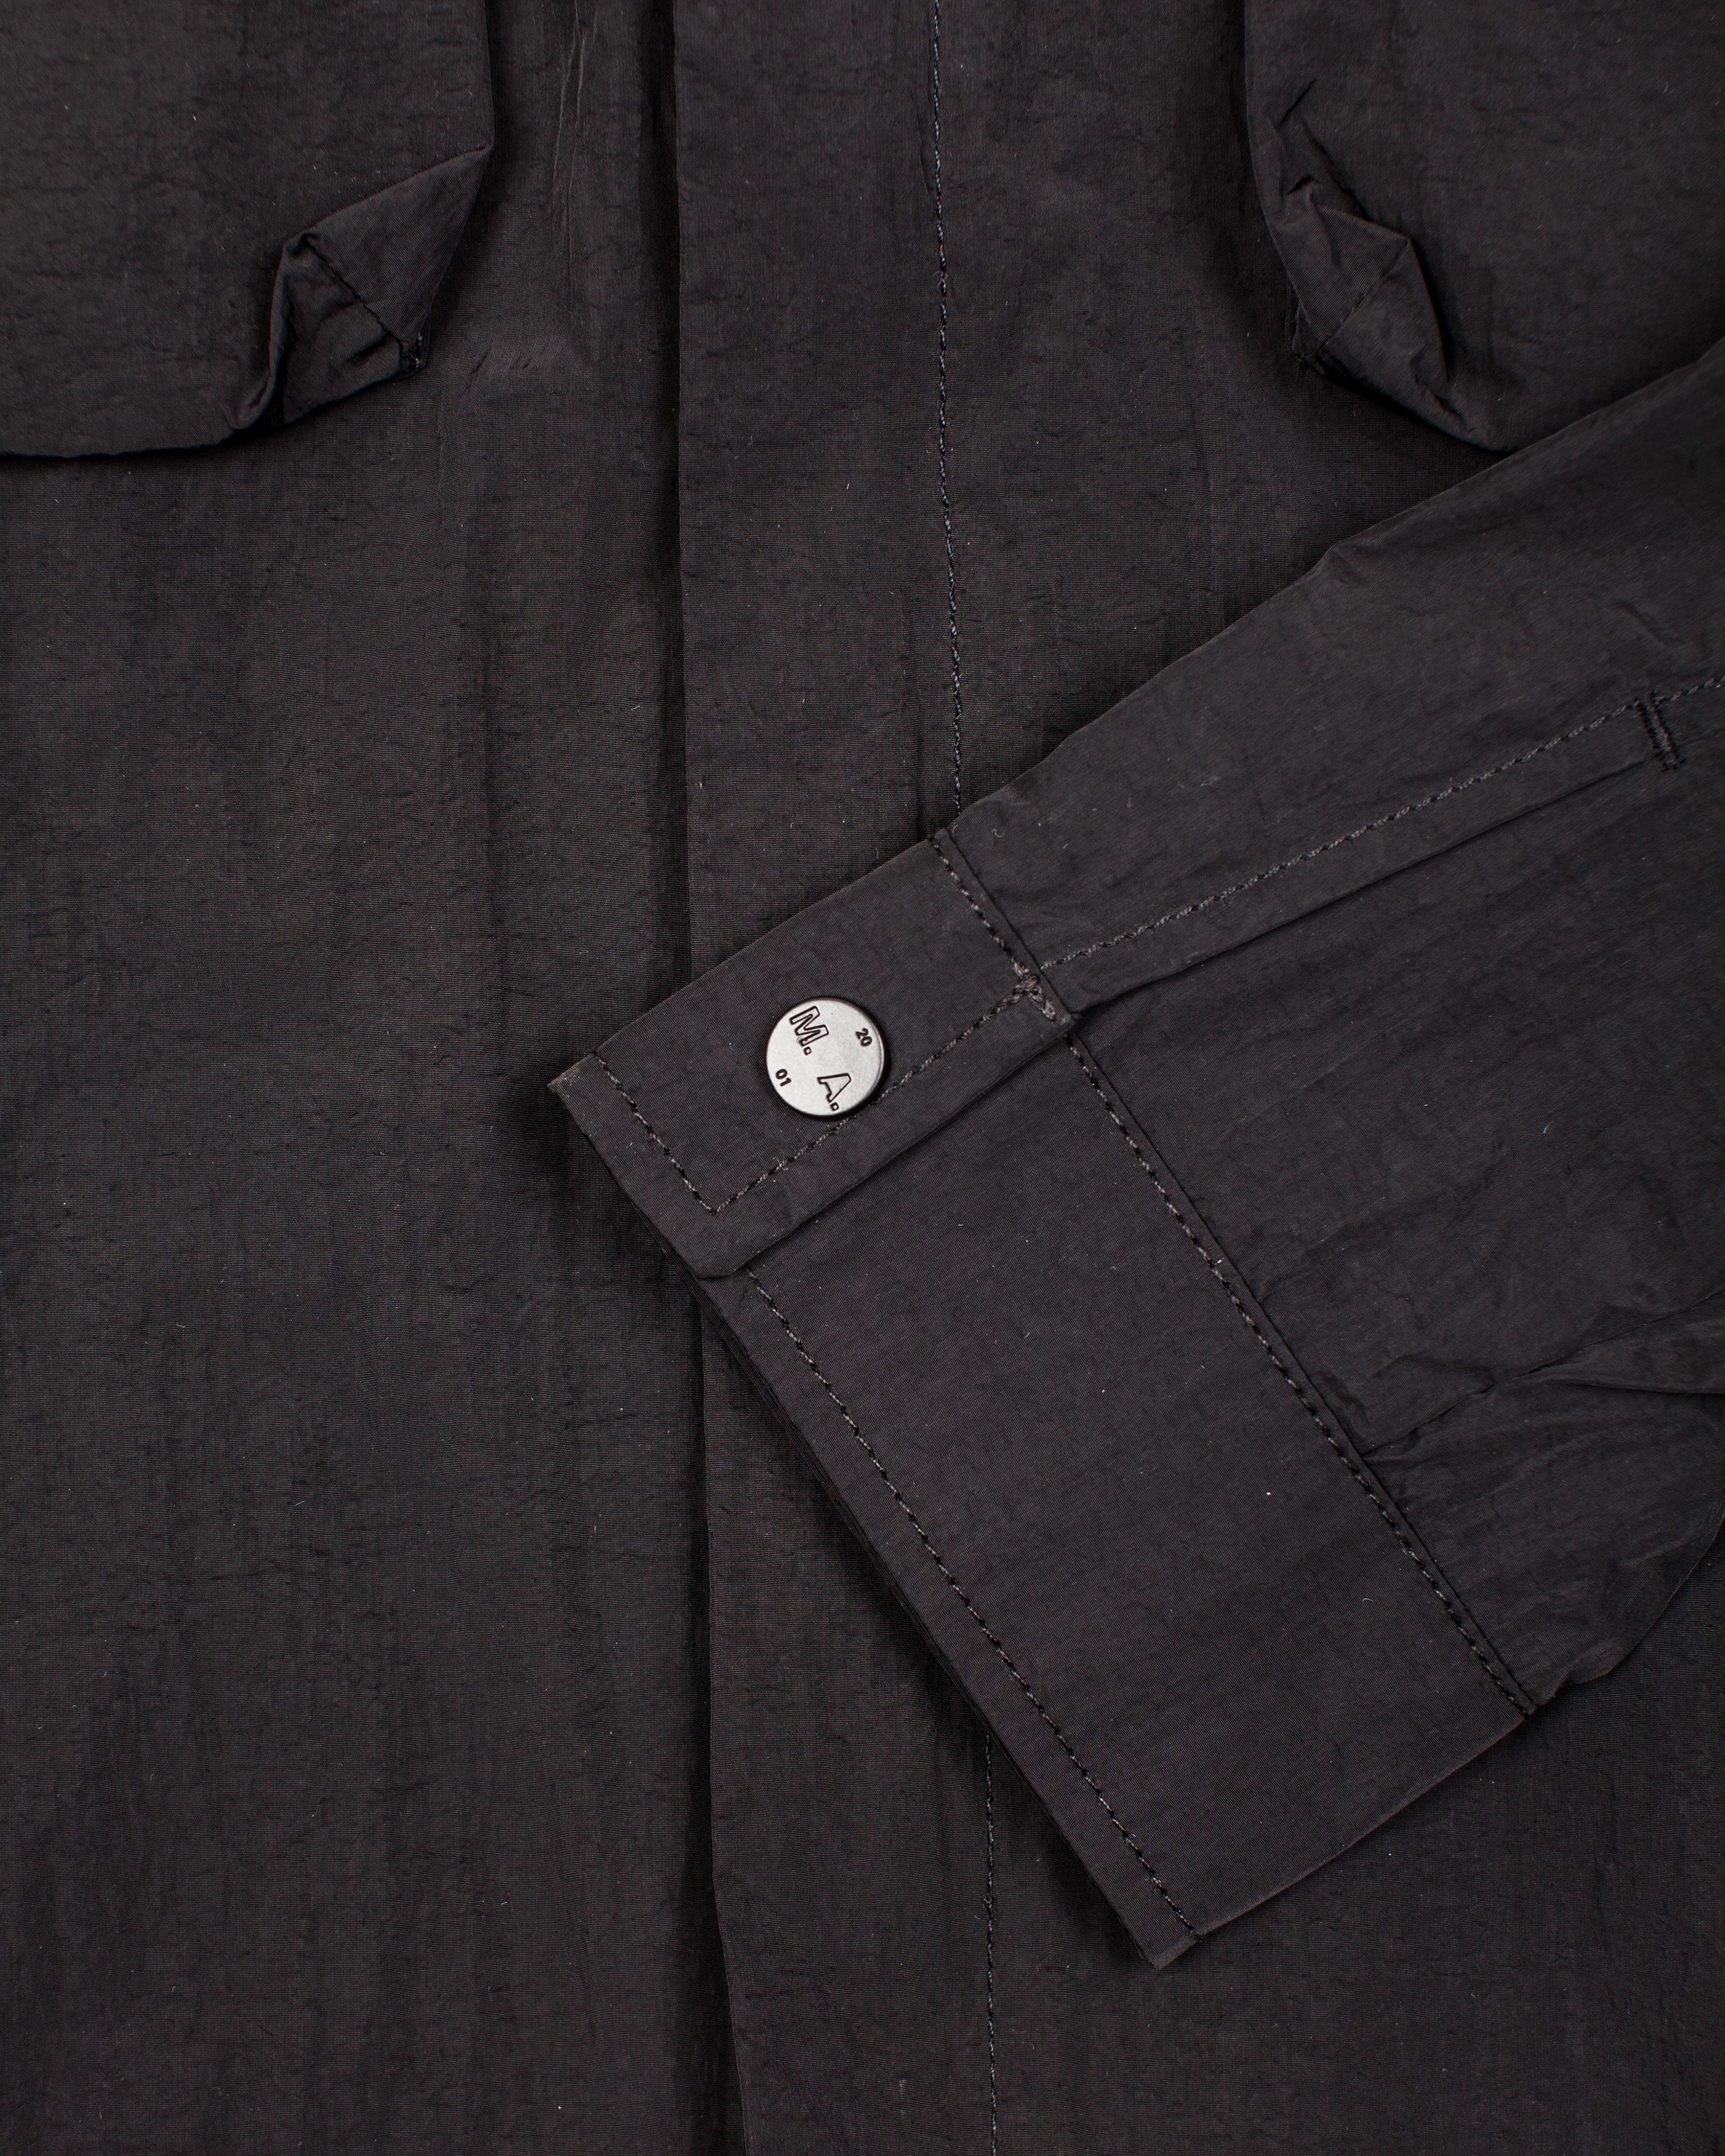 Ветровка Marshall Artist Liquid Bellow Overshirt Black